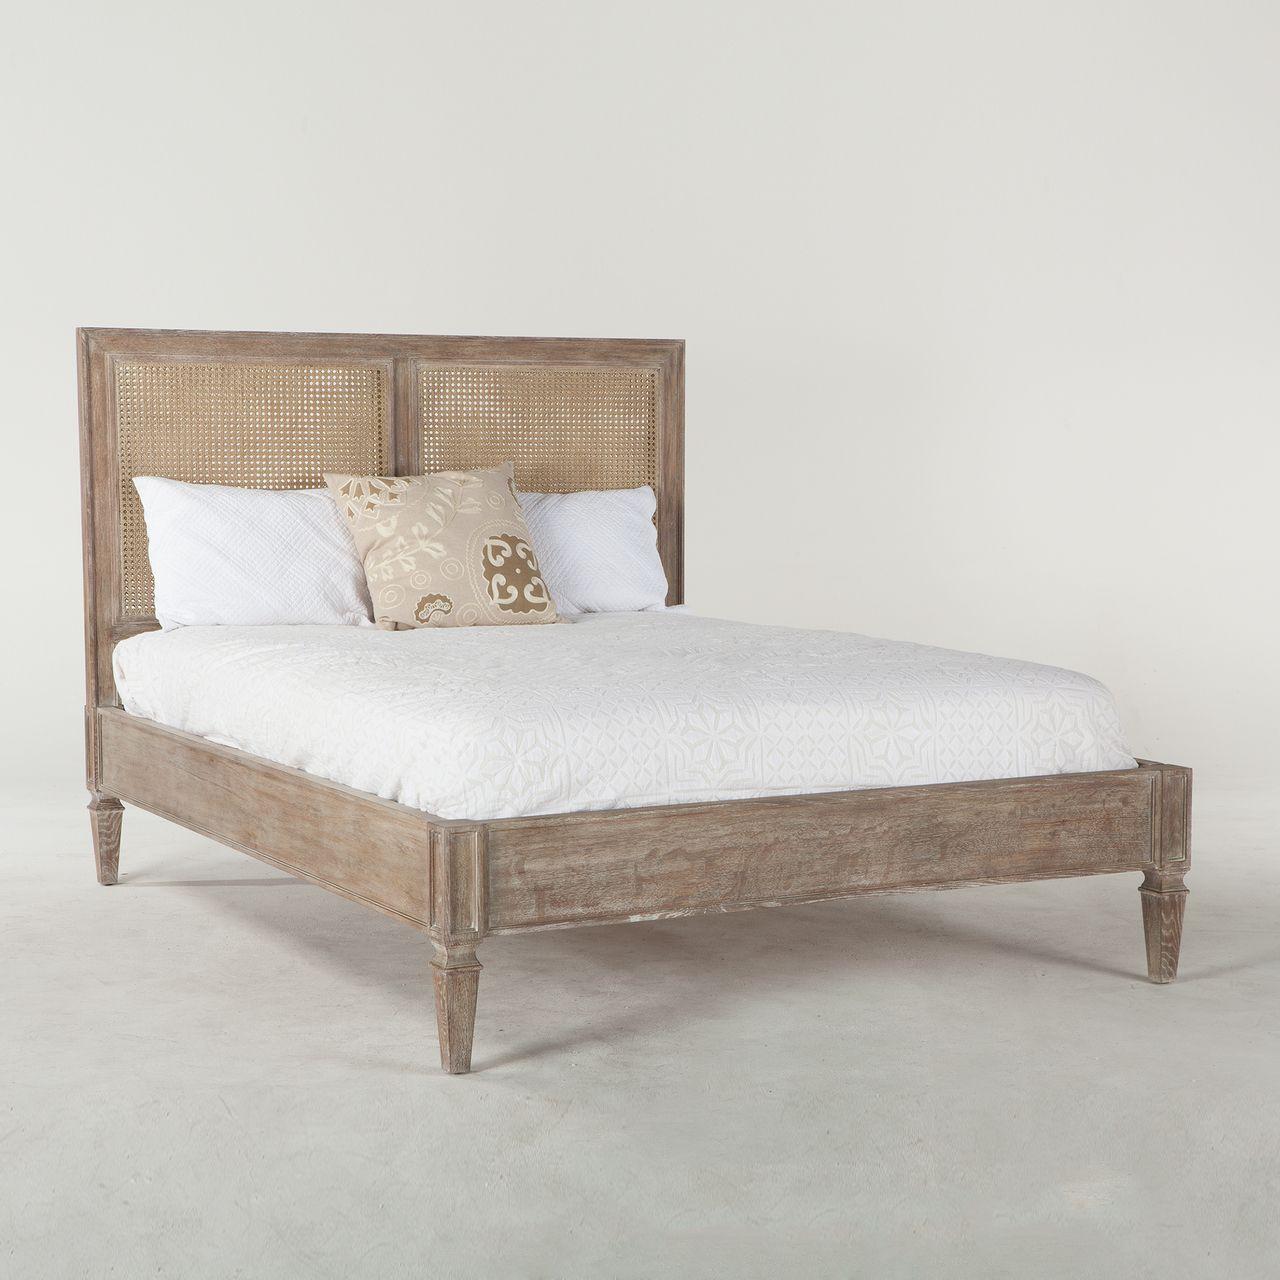 Shop Our Parisian Vintage Grey Oak Queen Size Platform Bed Frame